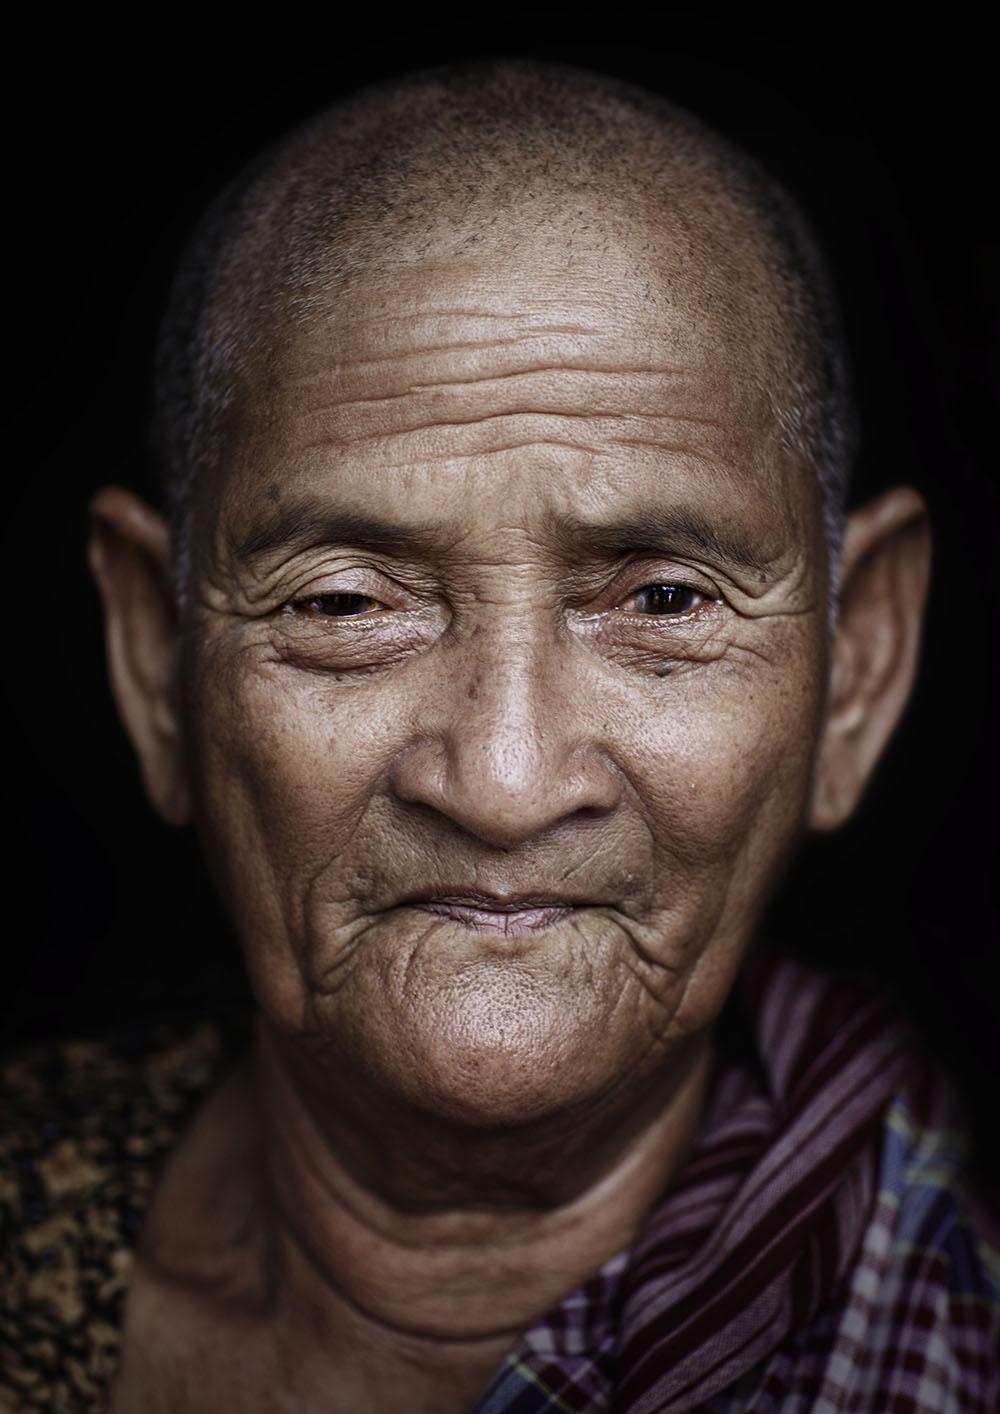 Portrait_Phnom Penh_04.jpg